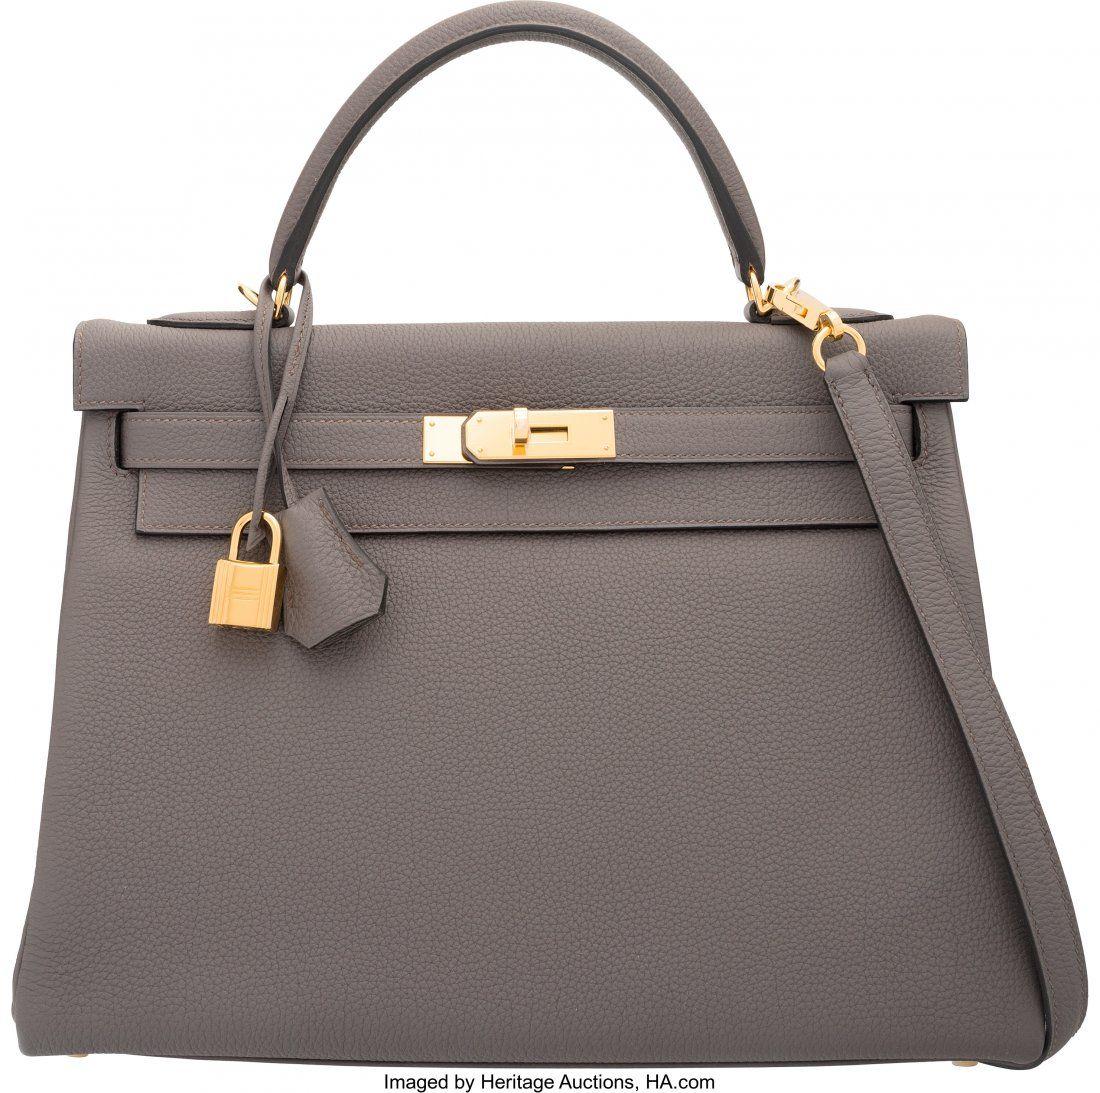 Hermes 32cm Etain Togo Leather Retourne Kelly Ba